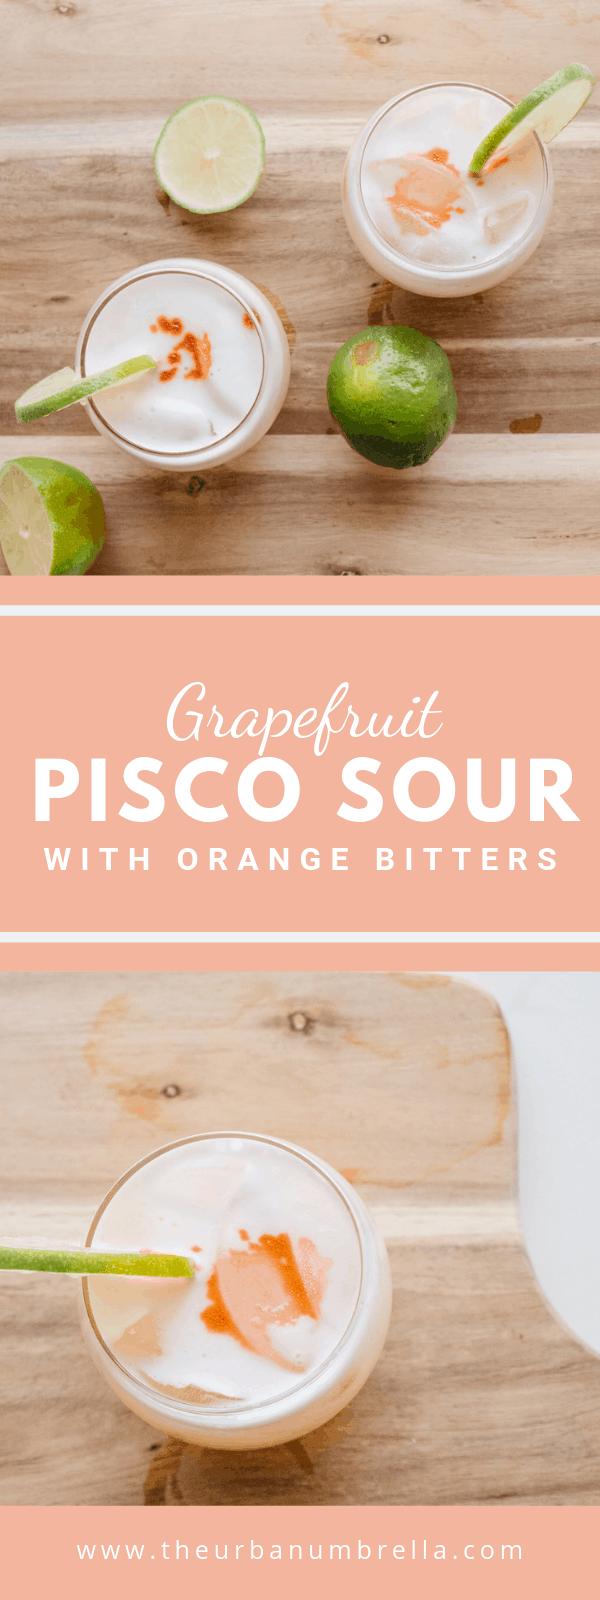 Grapefruit Pisco Sour with Orange Bitters